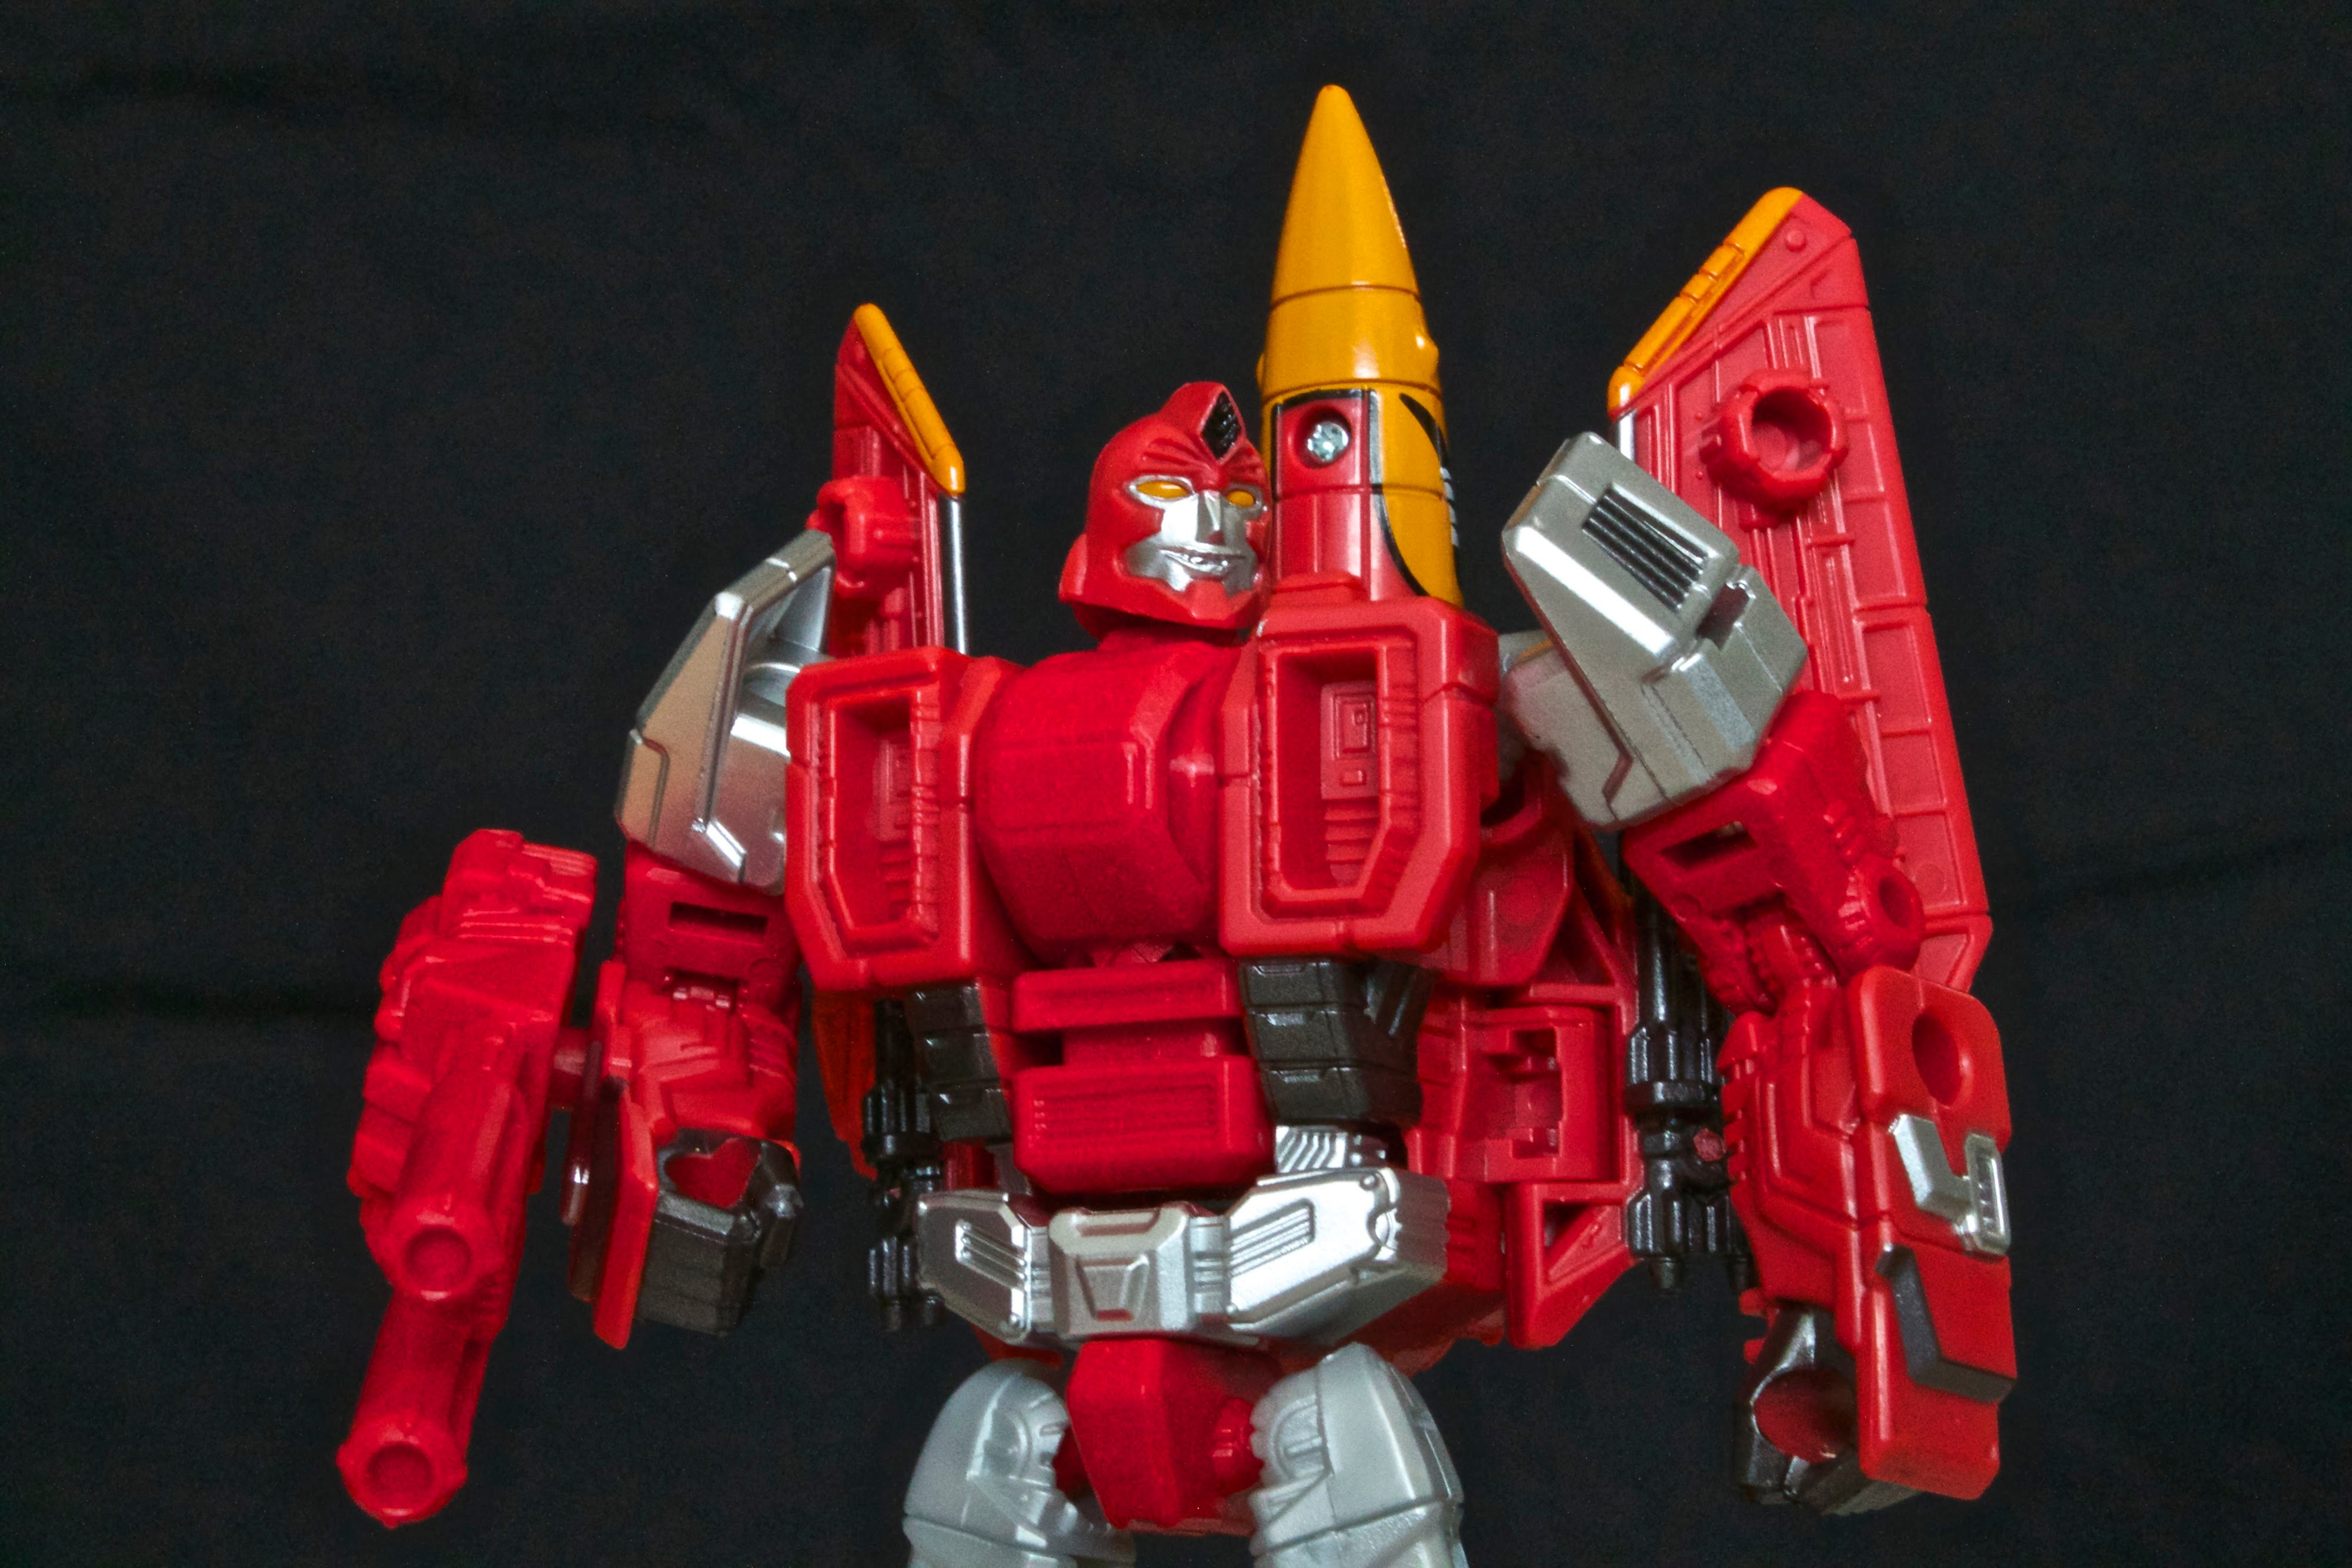 Botcon 2016 Transformers Attendee Only Bonus Figure Terrorsaur